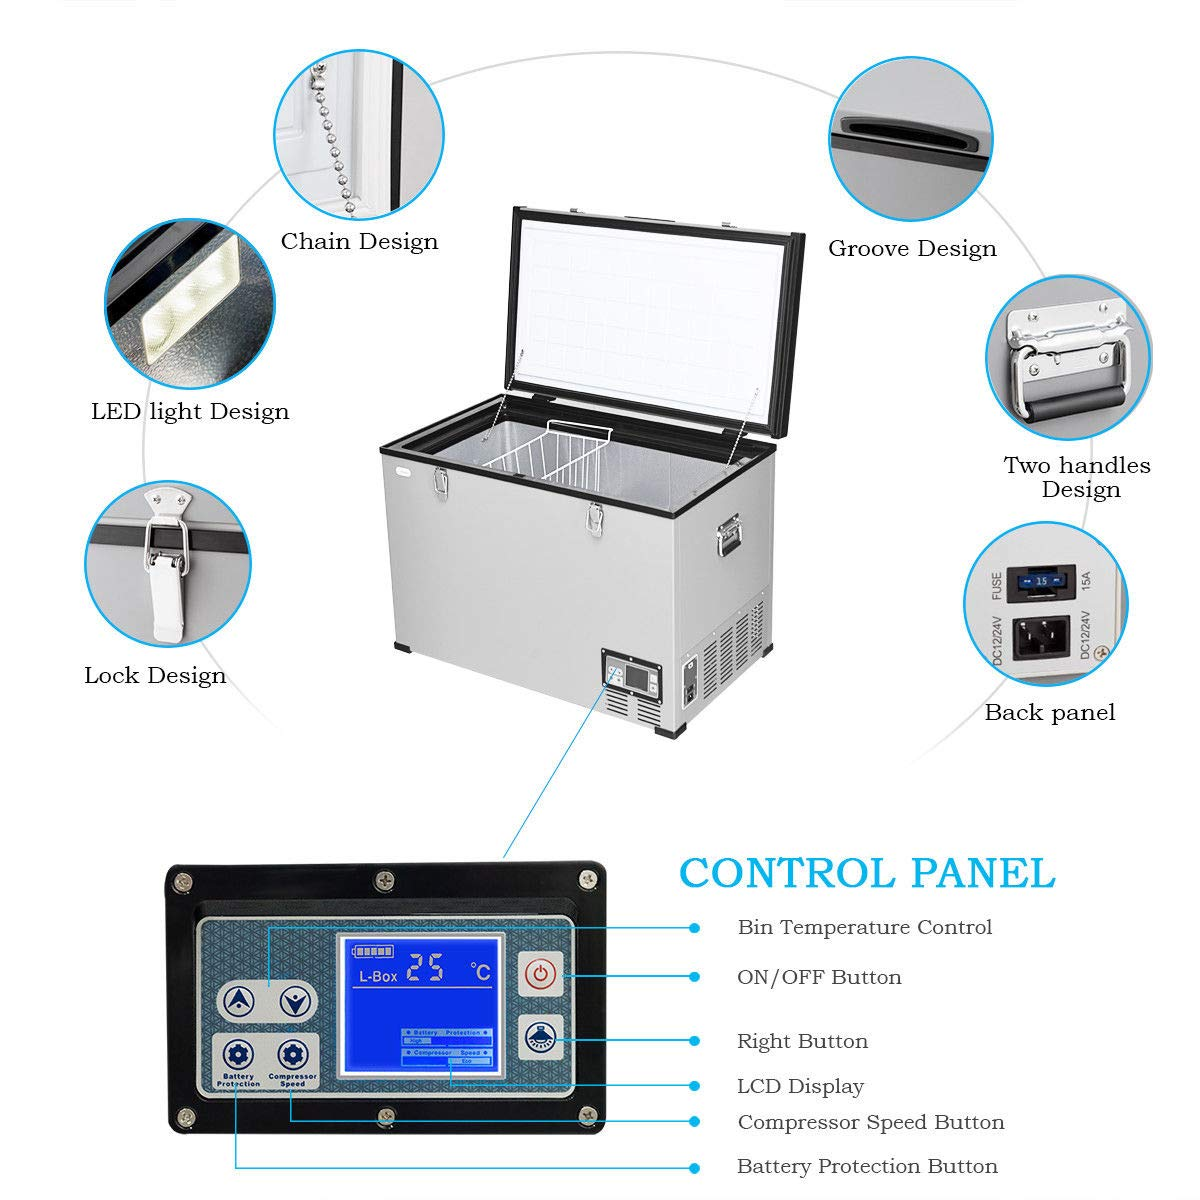 Amazon.com: Compresor de frigorífico eléctrico portátil de ...